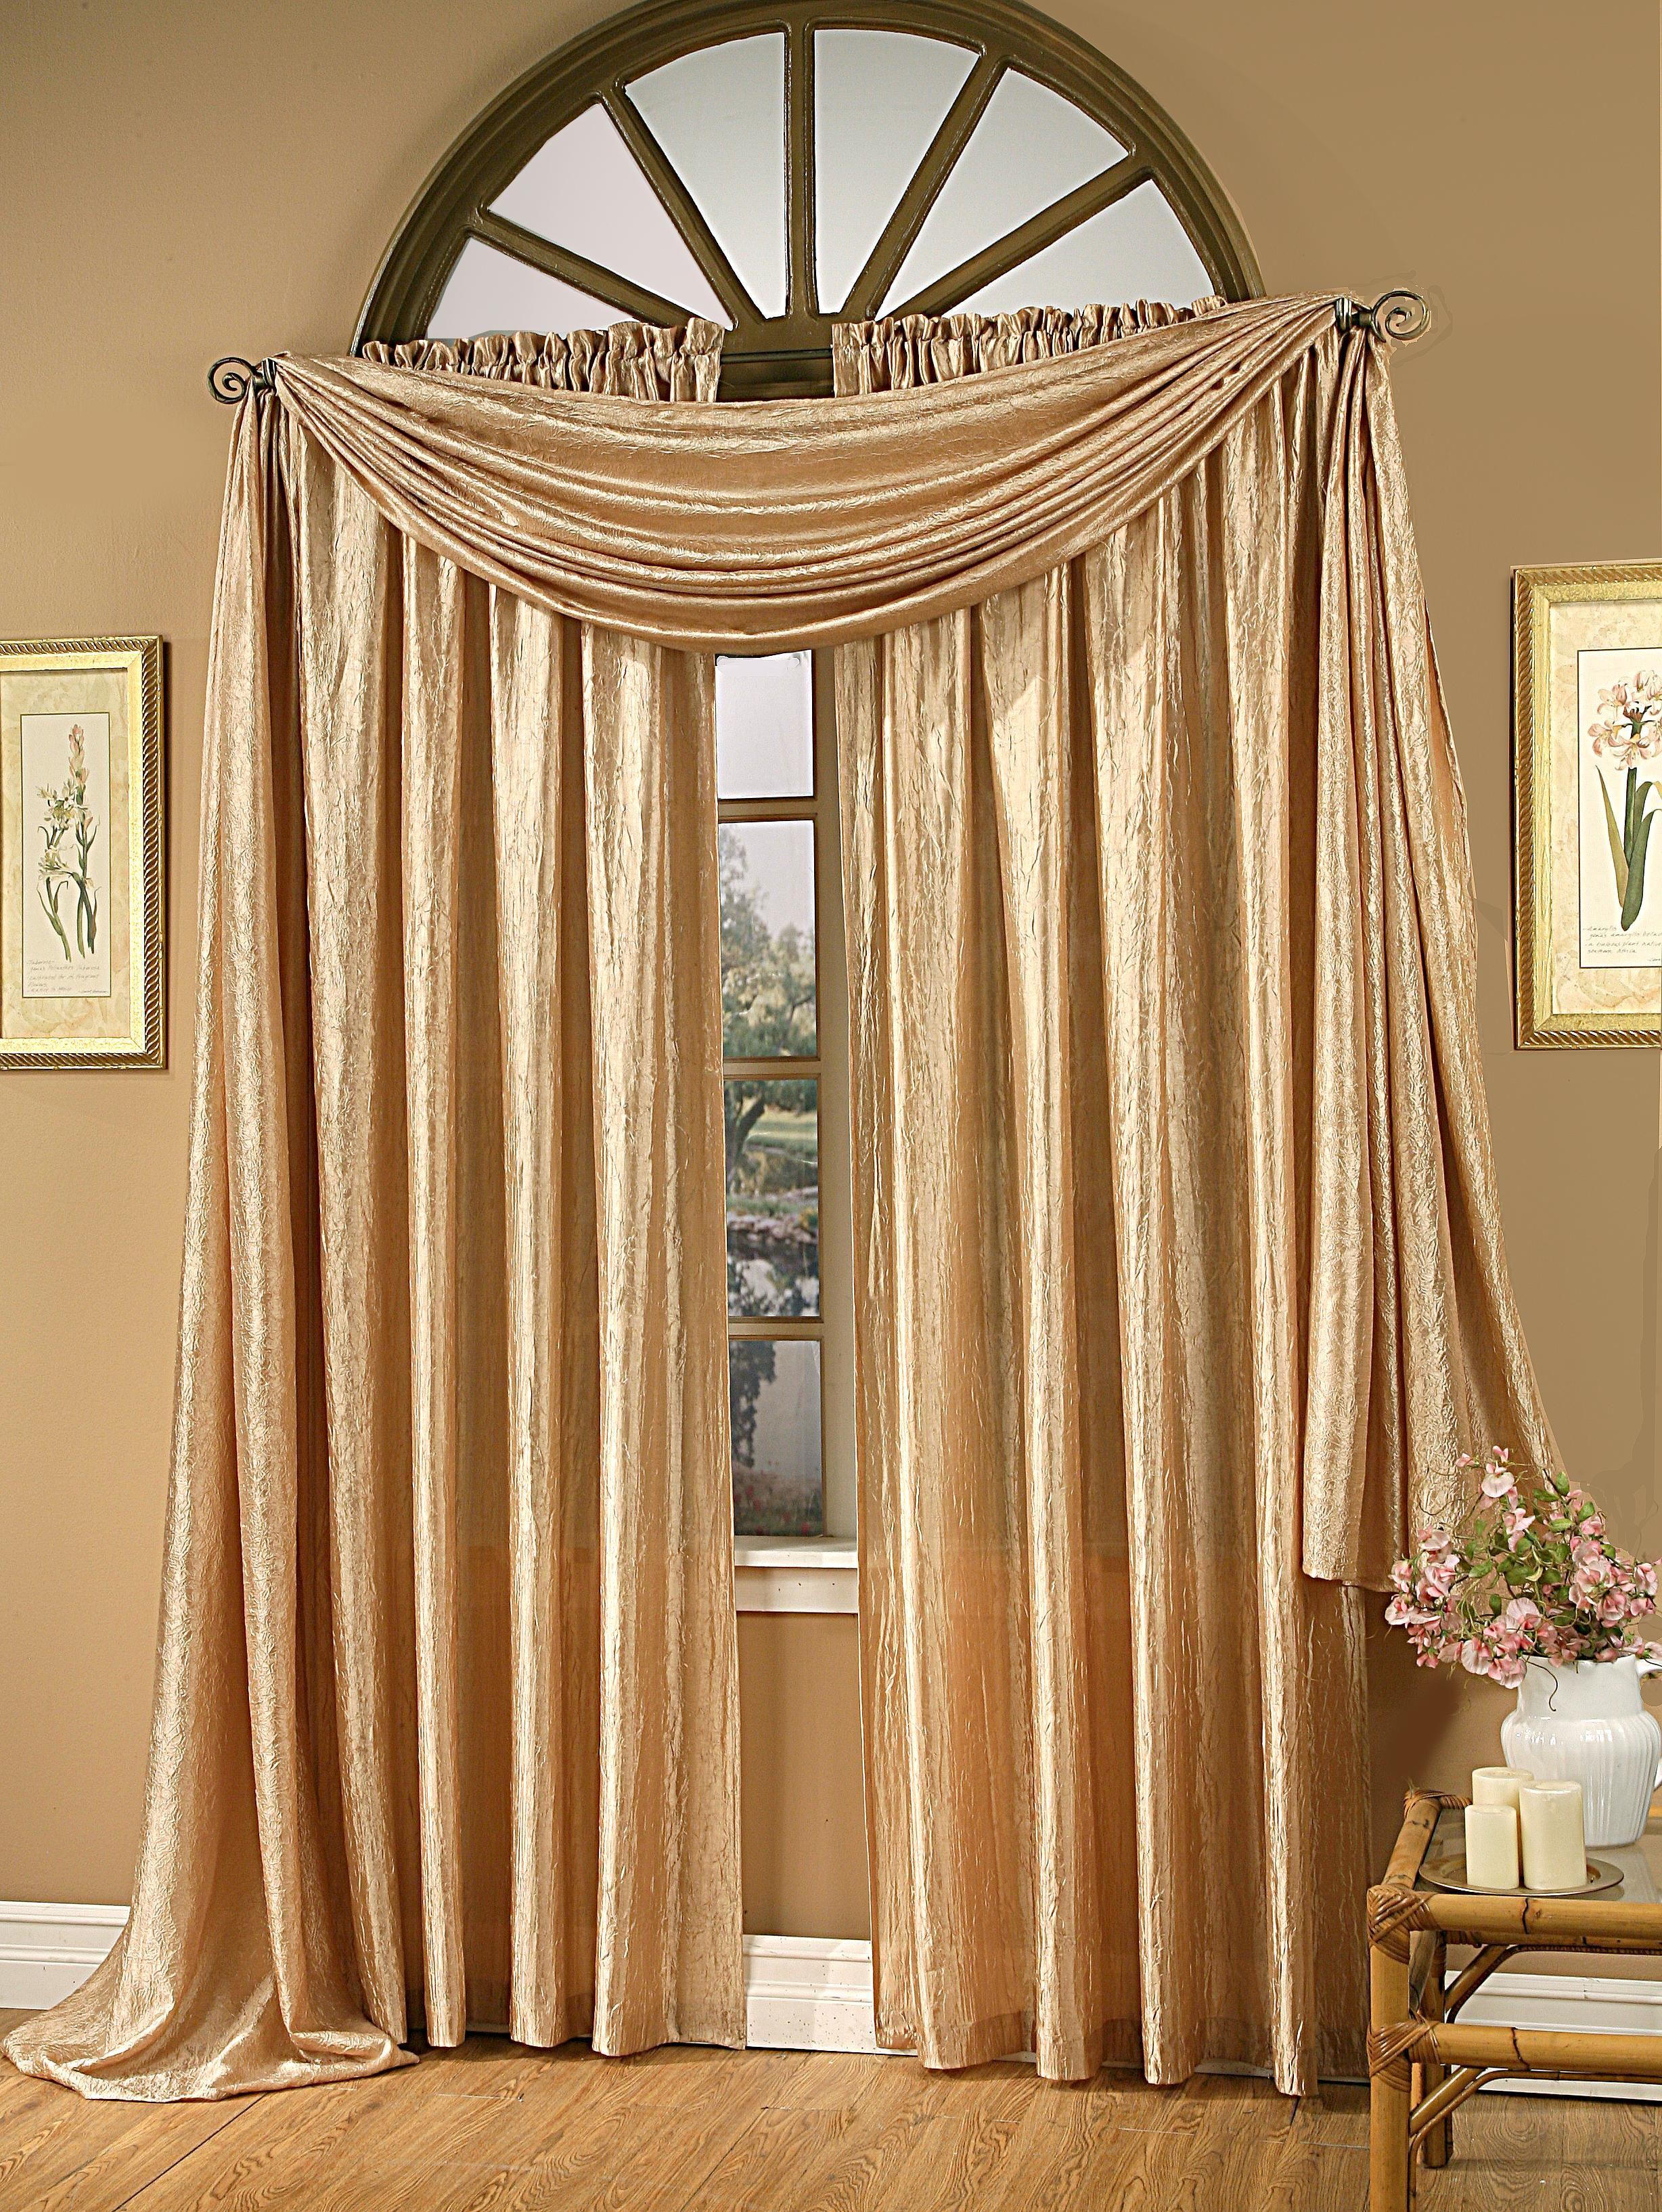 Whisper Is A Wonderful Crushed Satin Semi Sheer Style Curtain